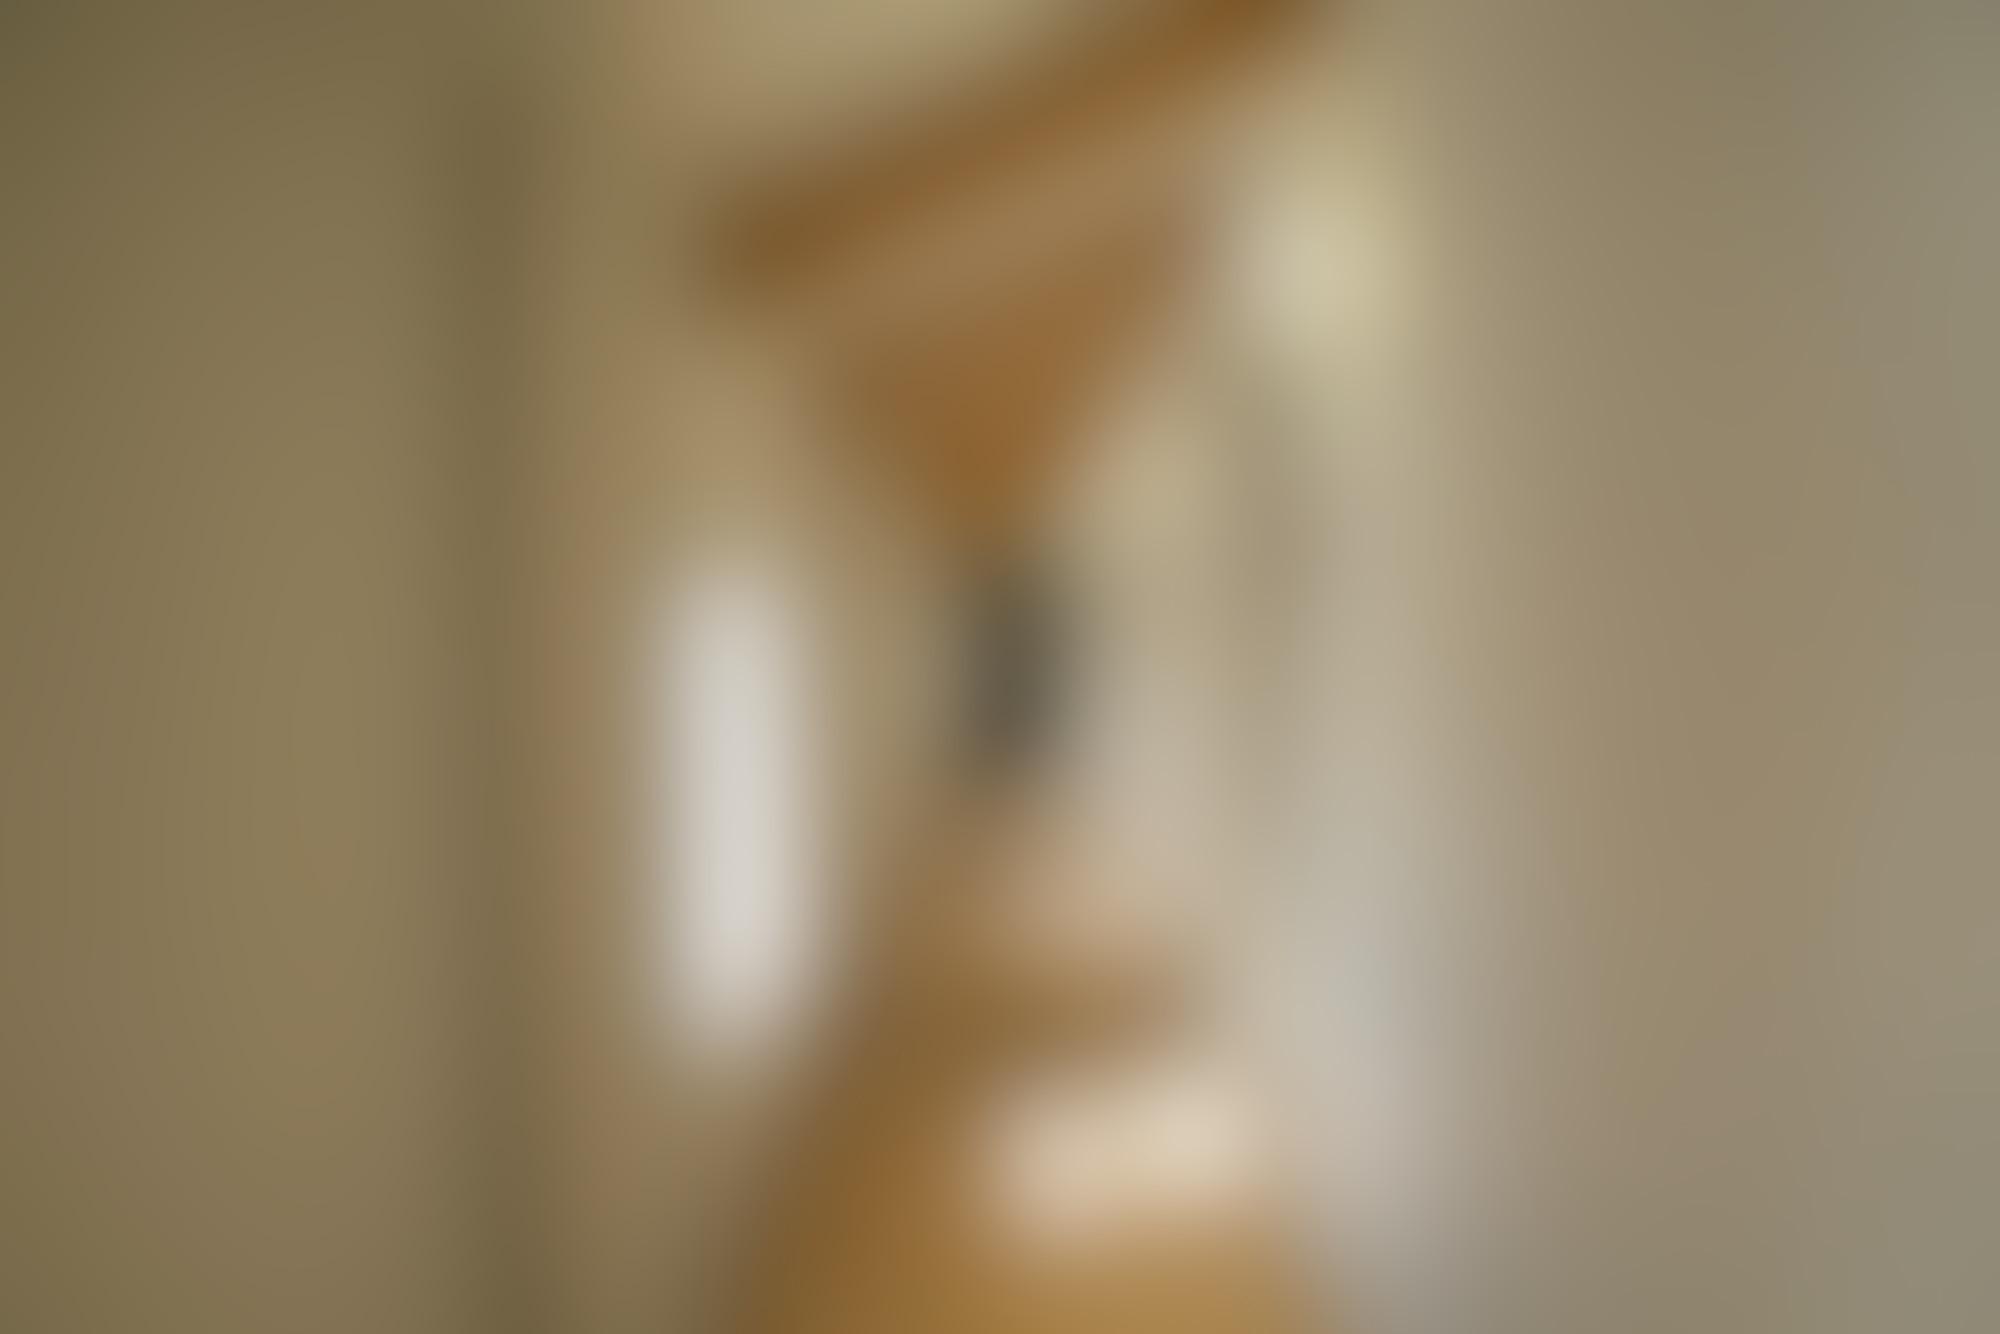 20170321 SJSPHOTO STUDIO BUILD LIP 17 autocompressfitresizeixlibphp 1 1 0max h2000max w3 D2000q80saf4bf61d8d9d90240b68db2c1ccee6f4